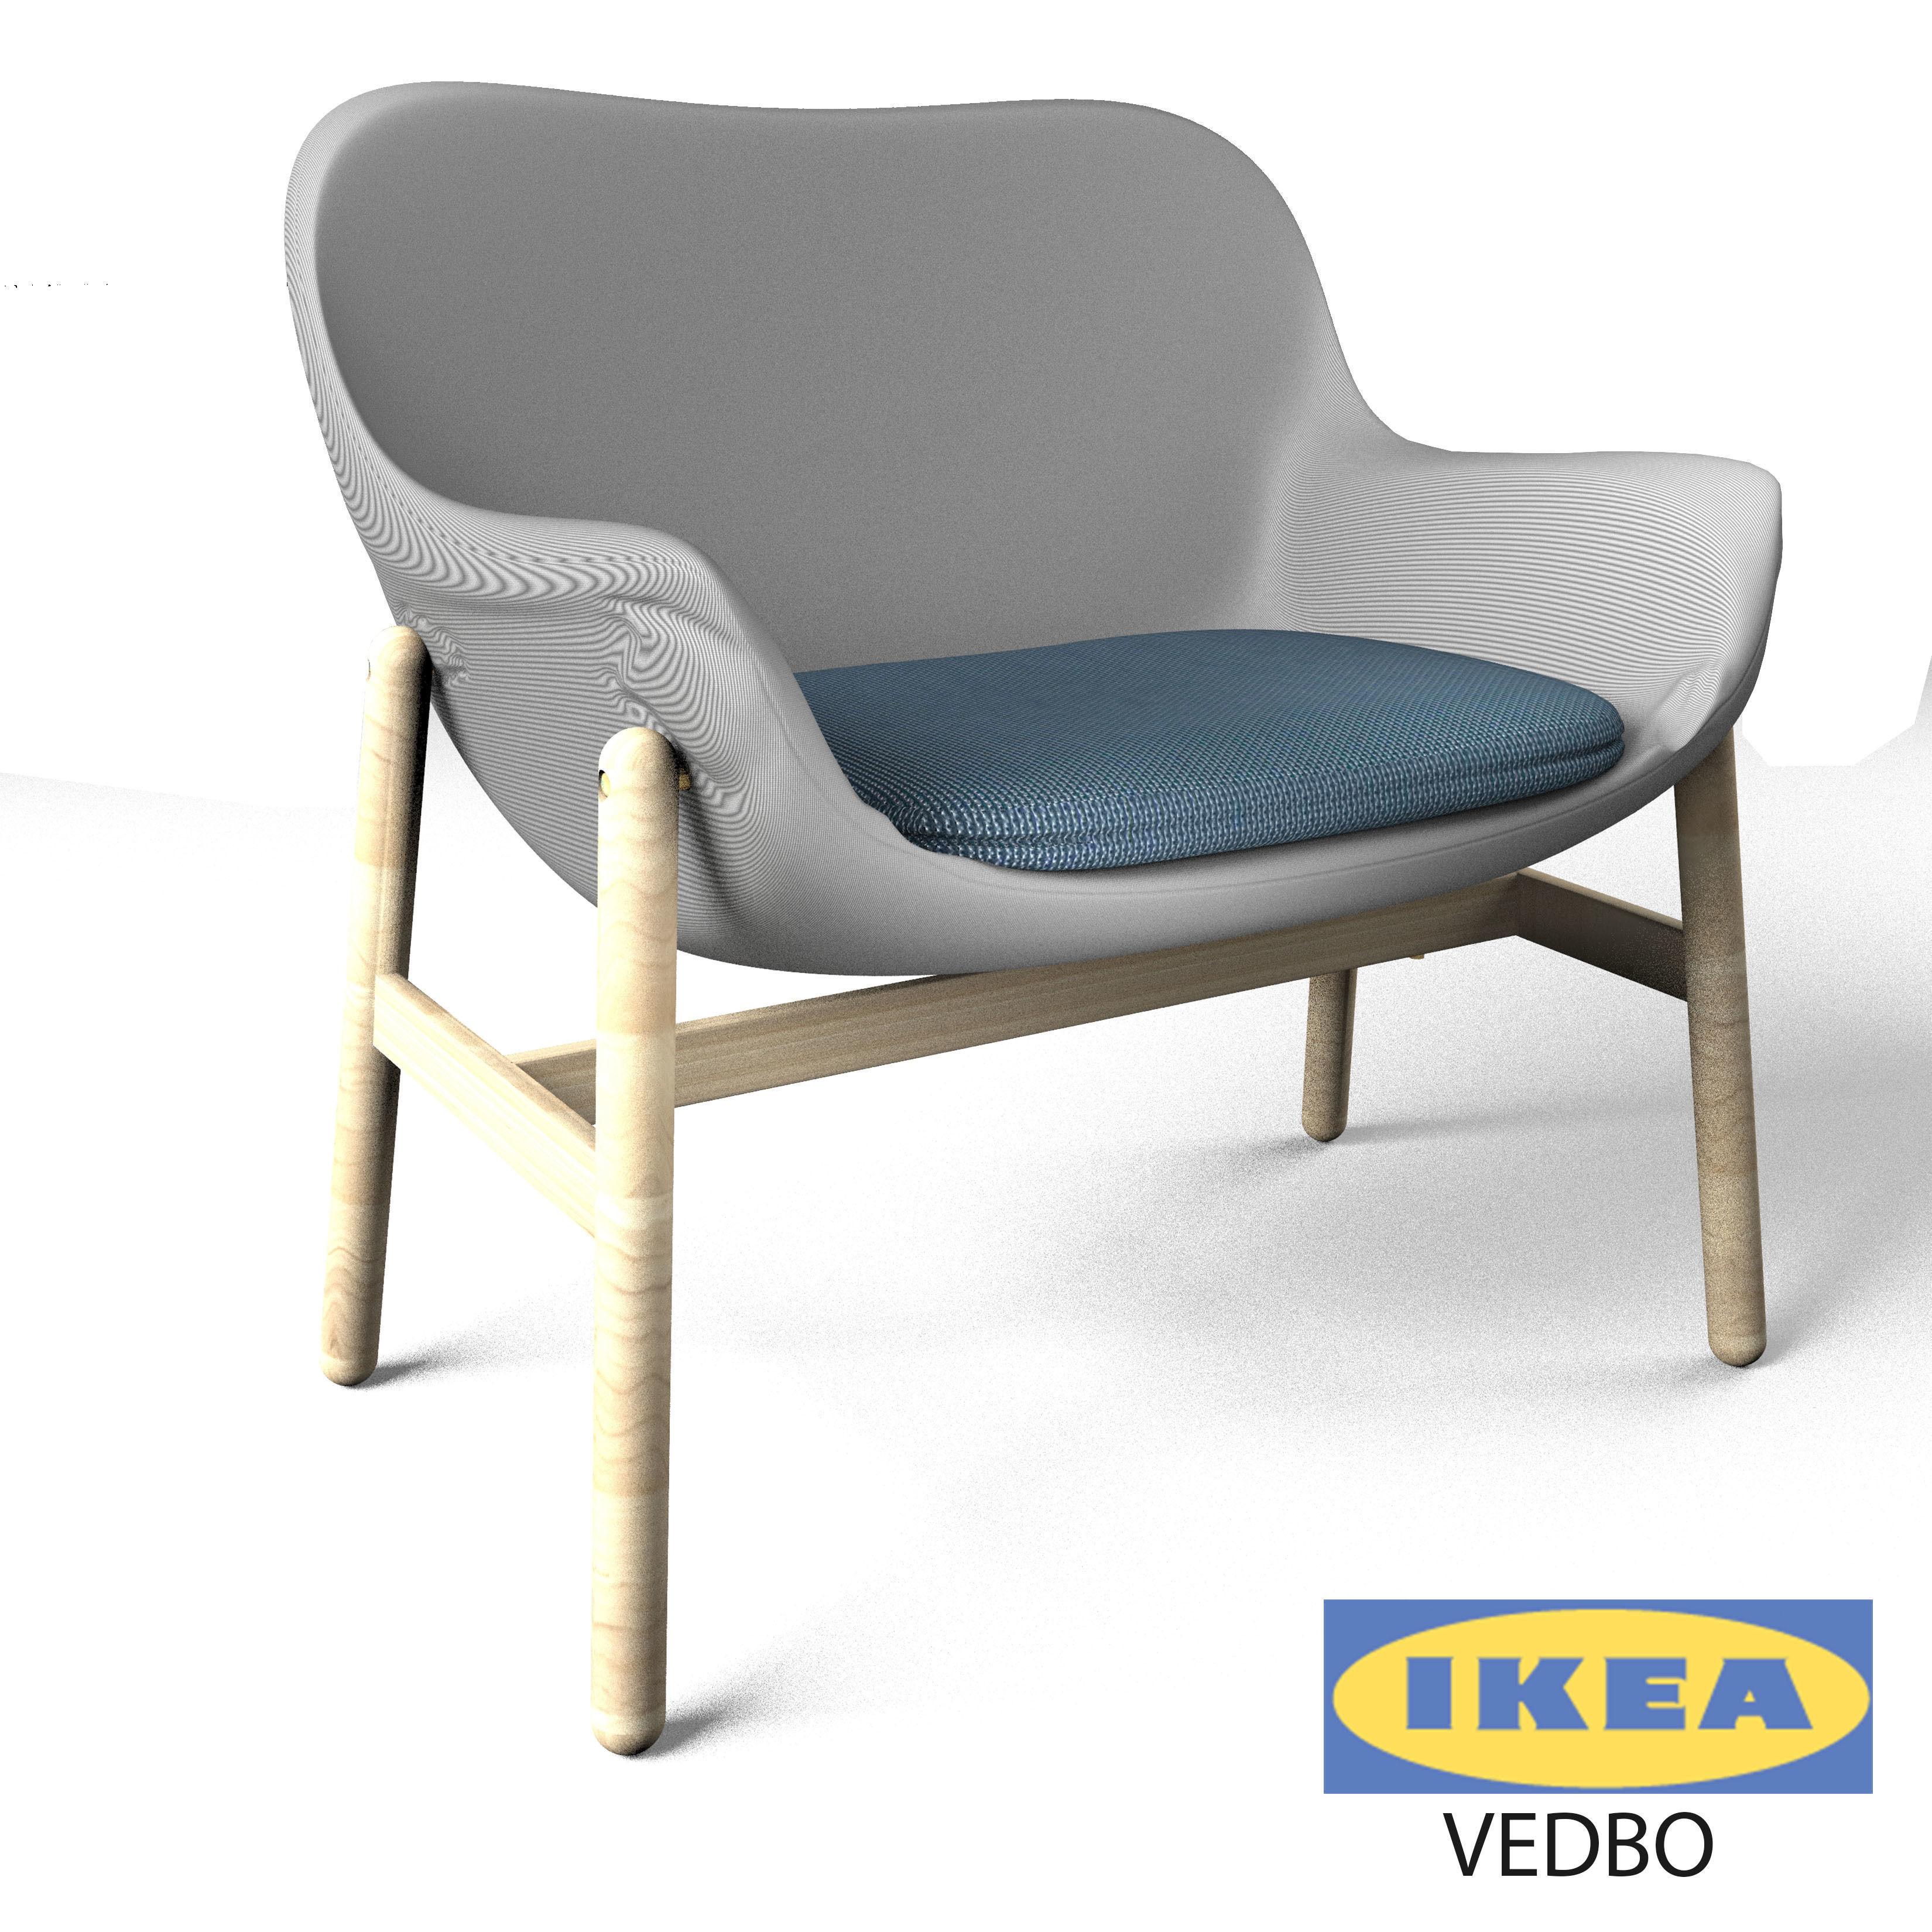 Superb Ikea Arm Chair 3d Model Max Obj Fbx Mtl Mat 1 ...